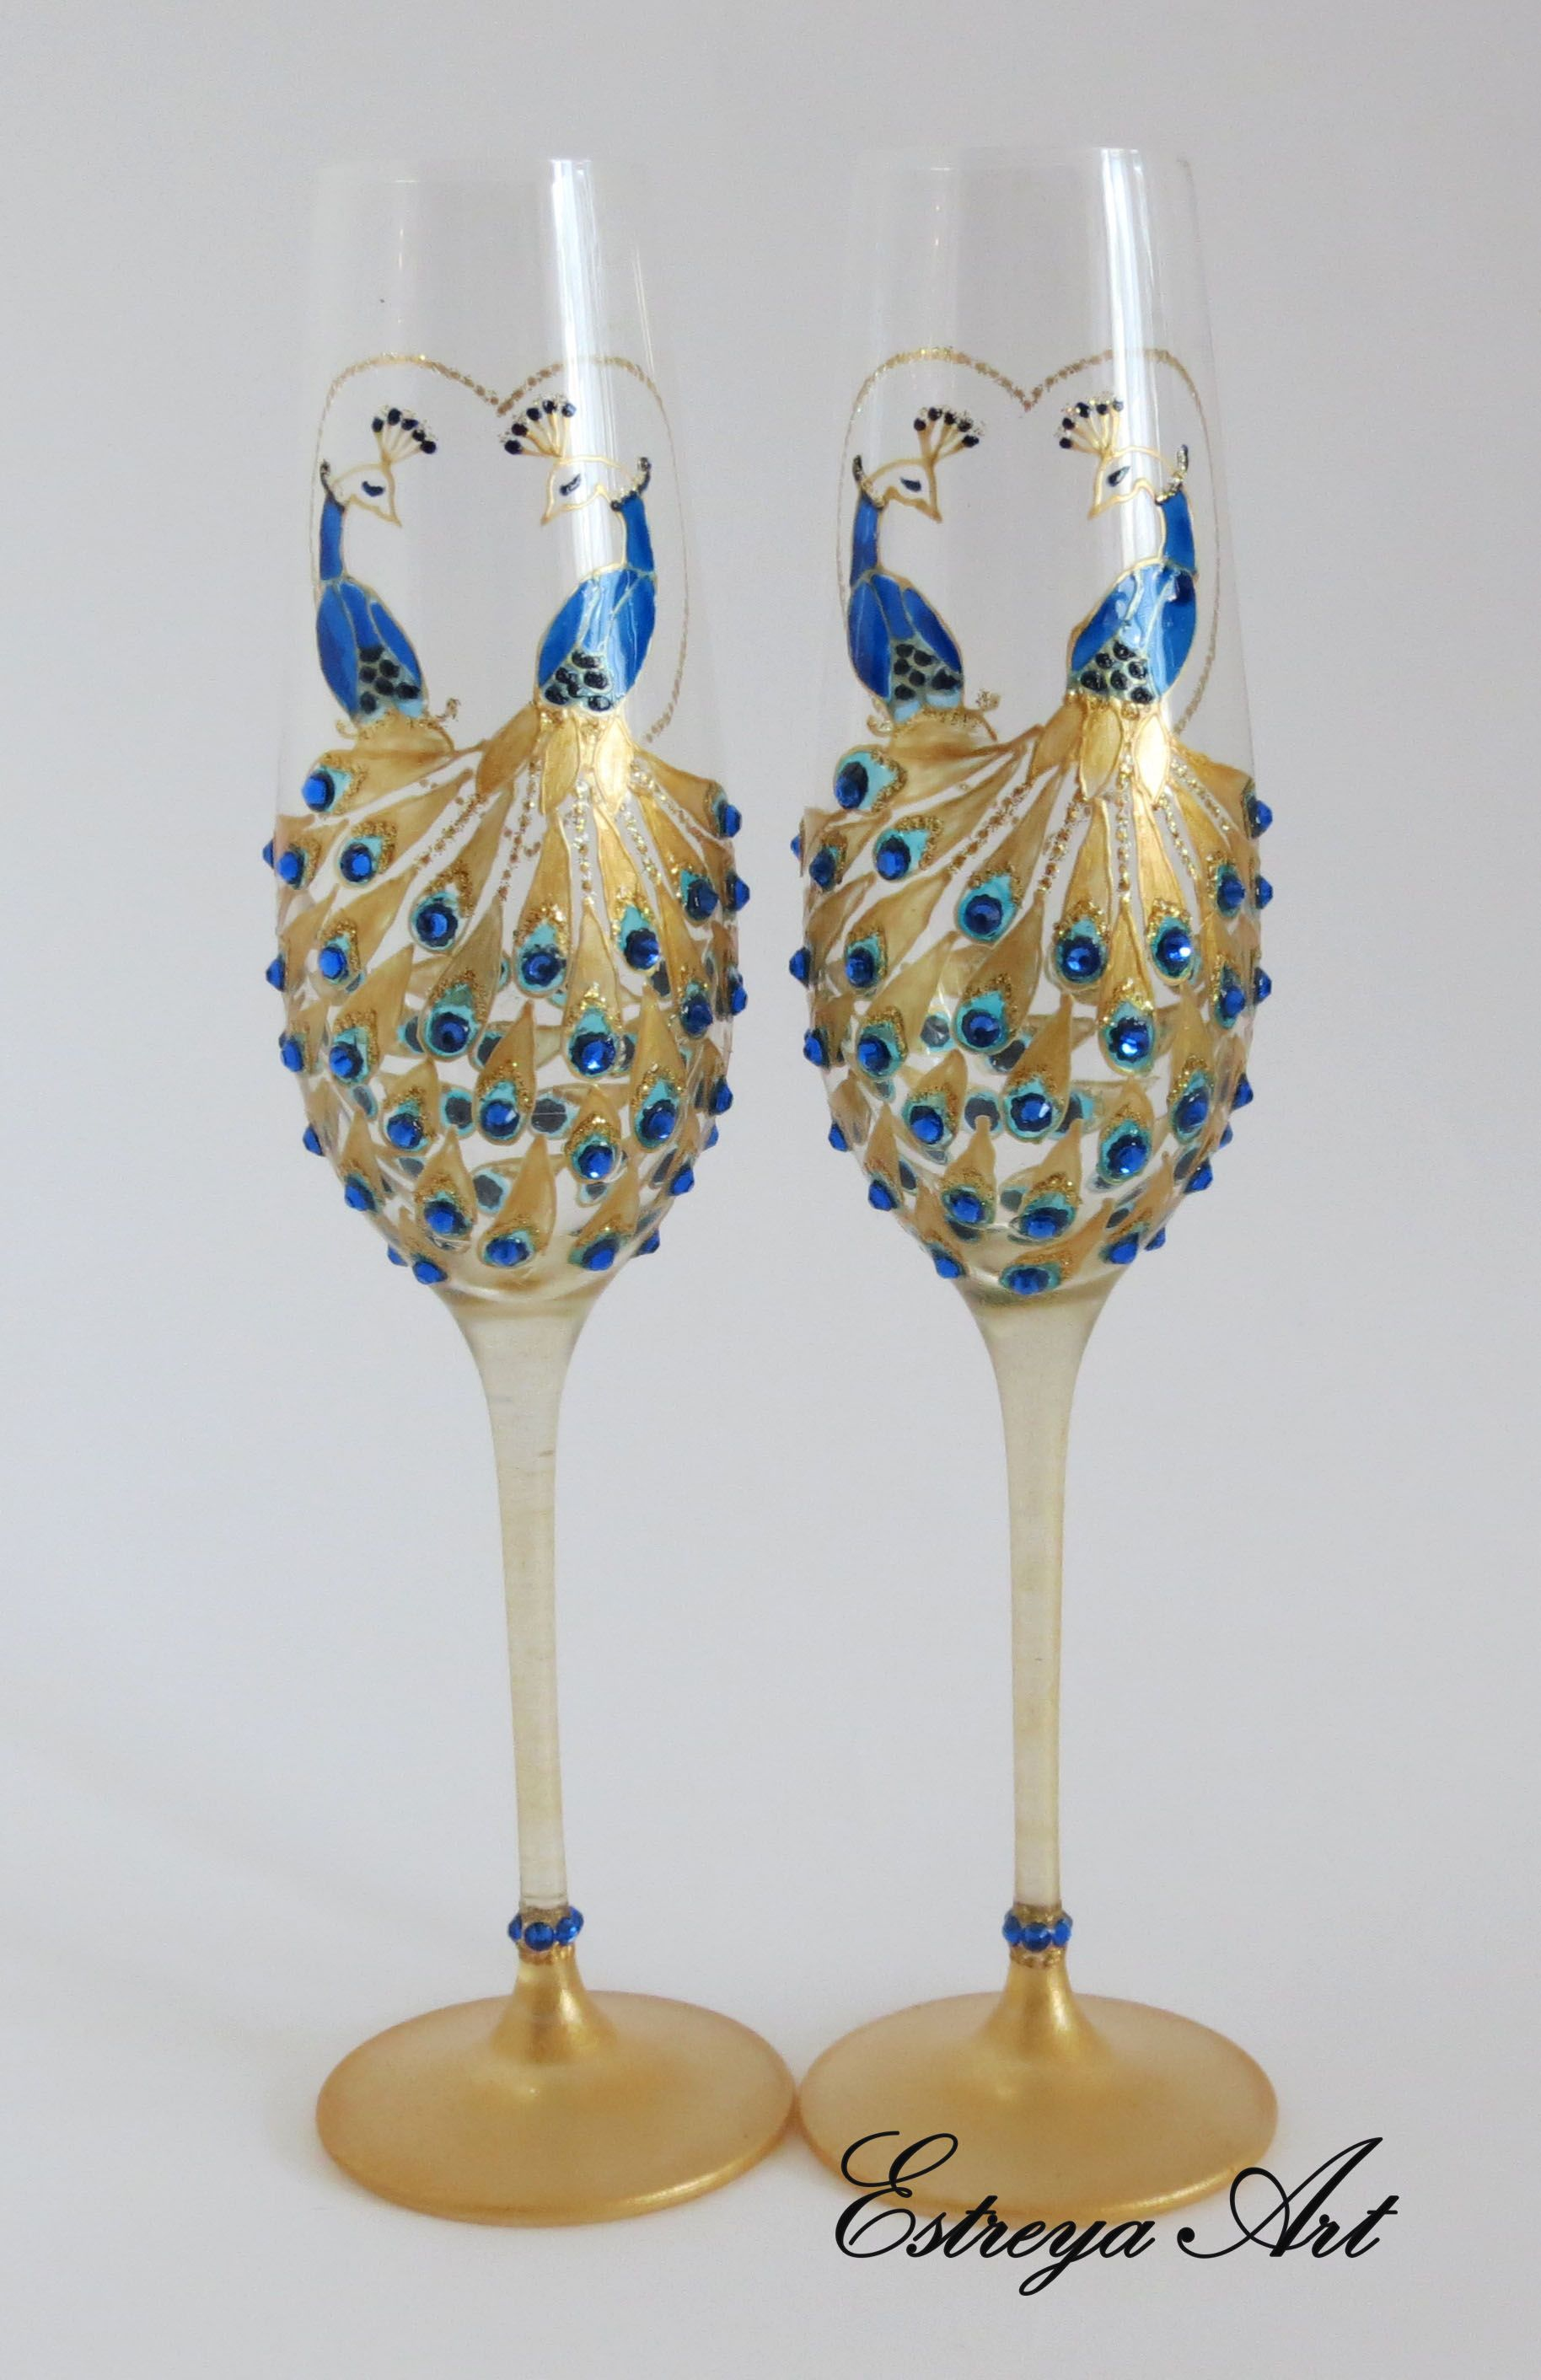 Unique Crystal Hand Painted Chanpagne Flutes